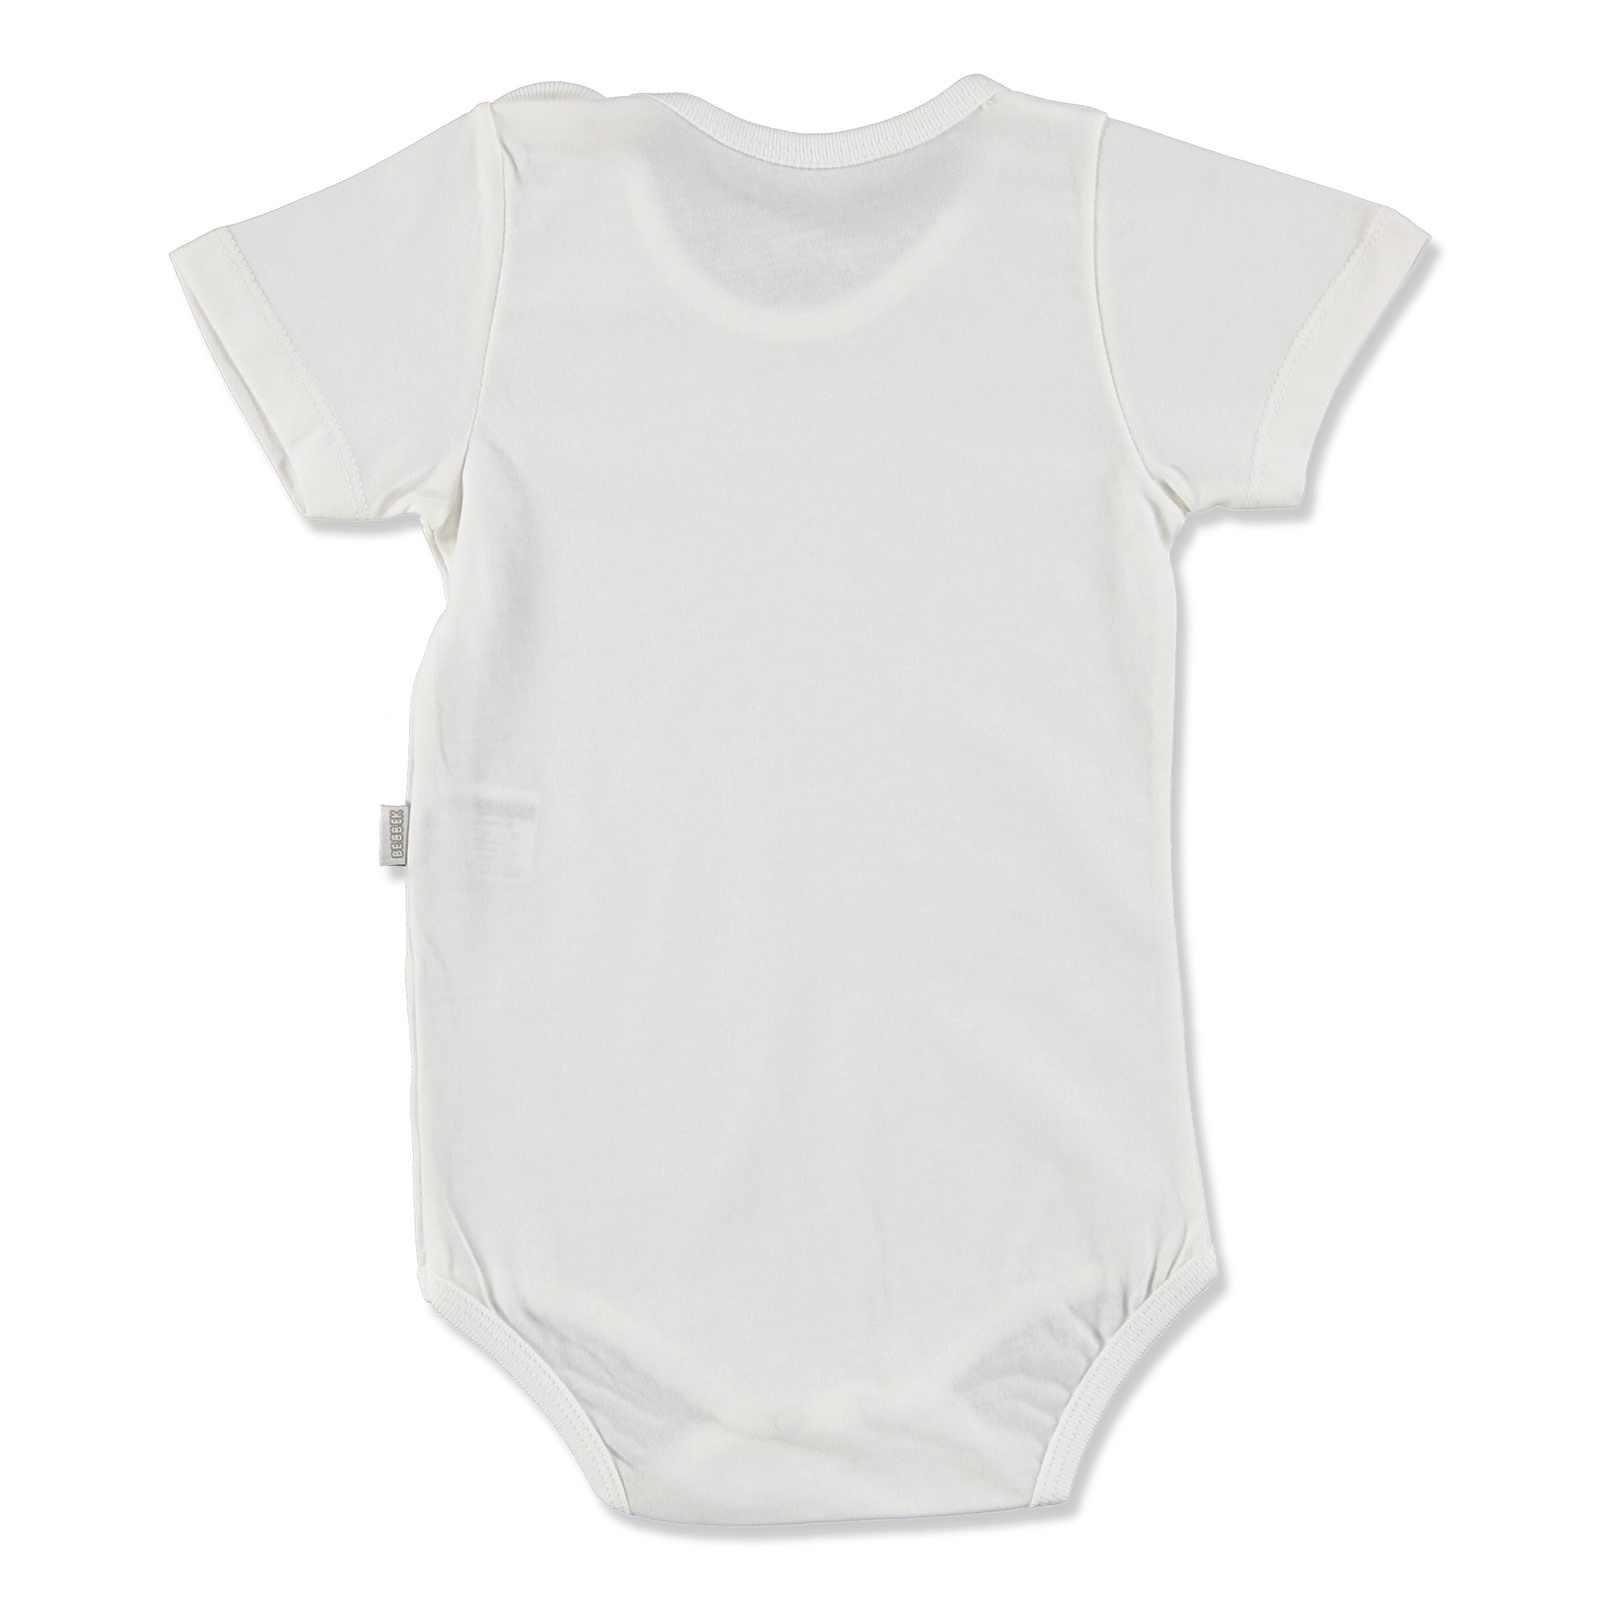 Ebebek Bebbek ฤดูร้อนเด็กทารก Super CREW-คอ Bodysuit